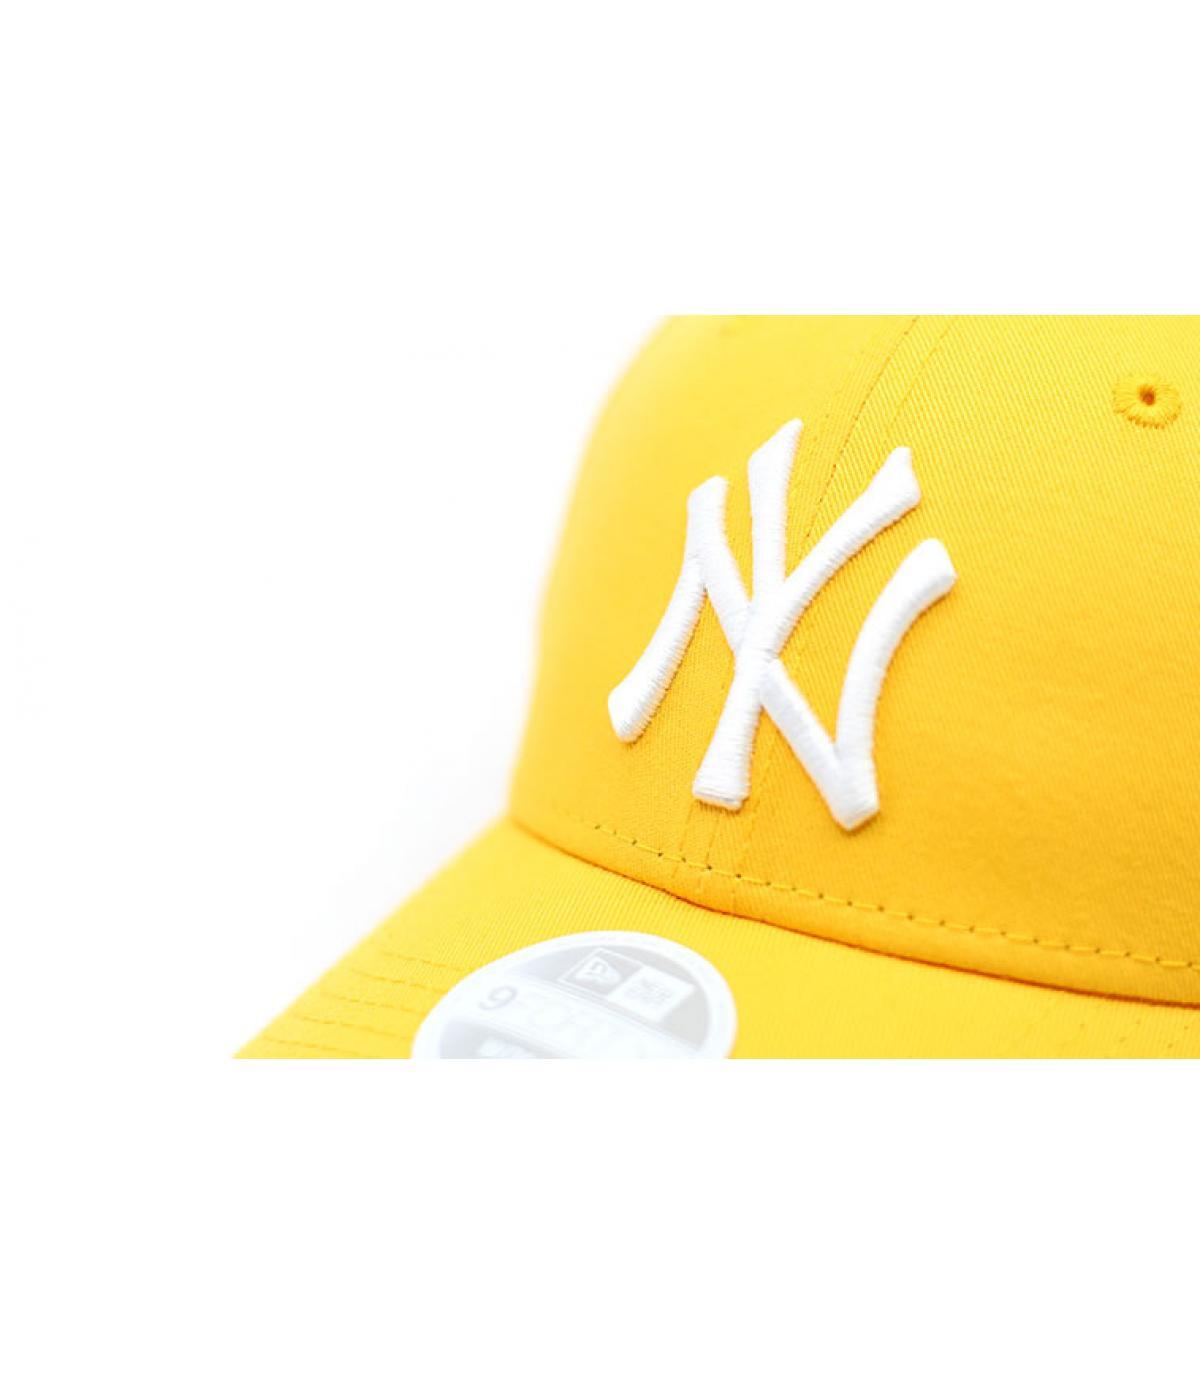 Details Cap  Wmns League Ess NY 9Forty gold - Abbildung 3